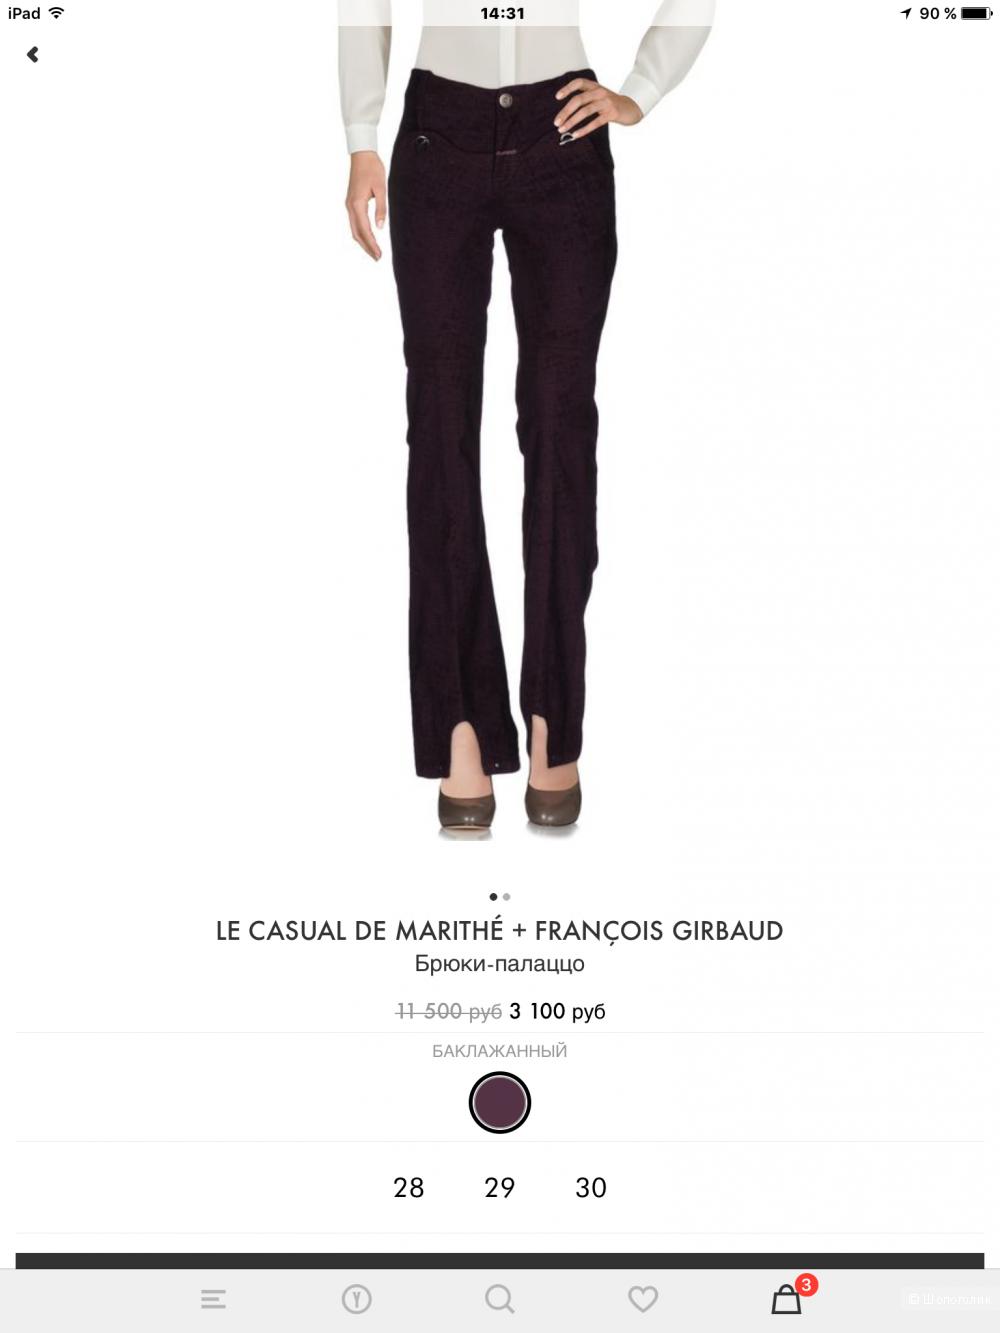 Брюки Le casual de marithe + Francois girbaud 29 размер